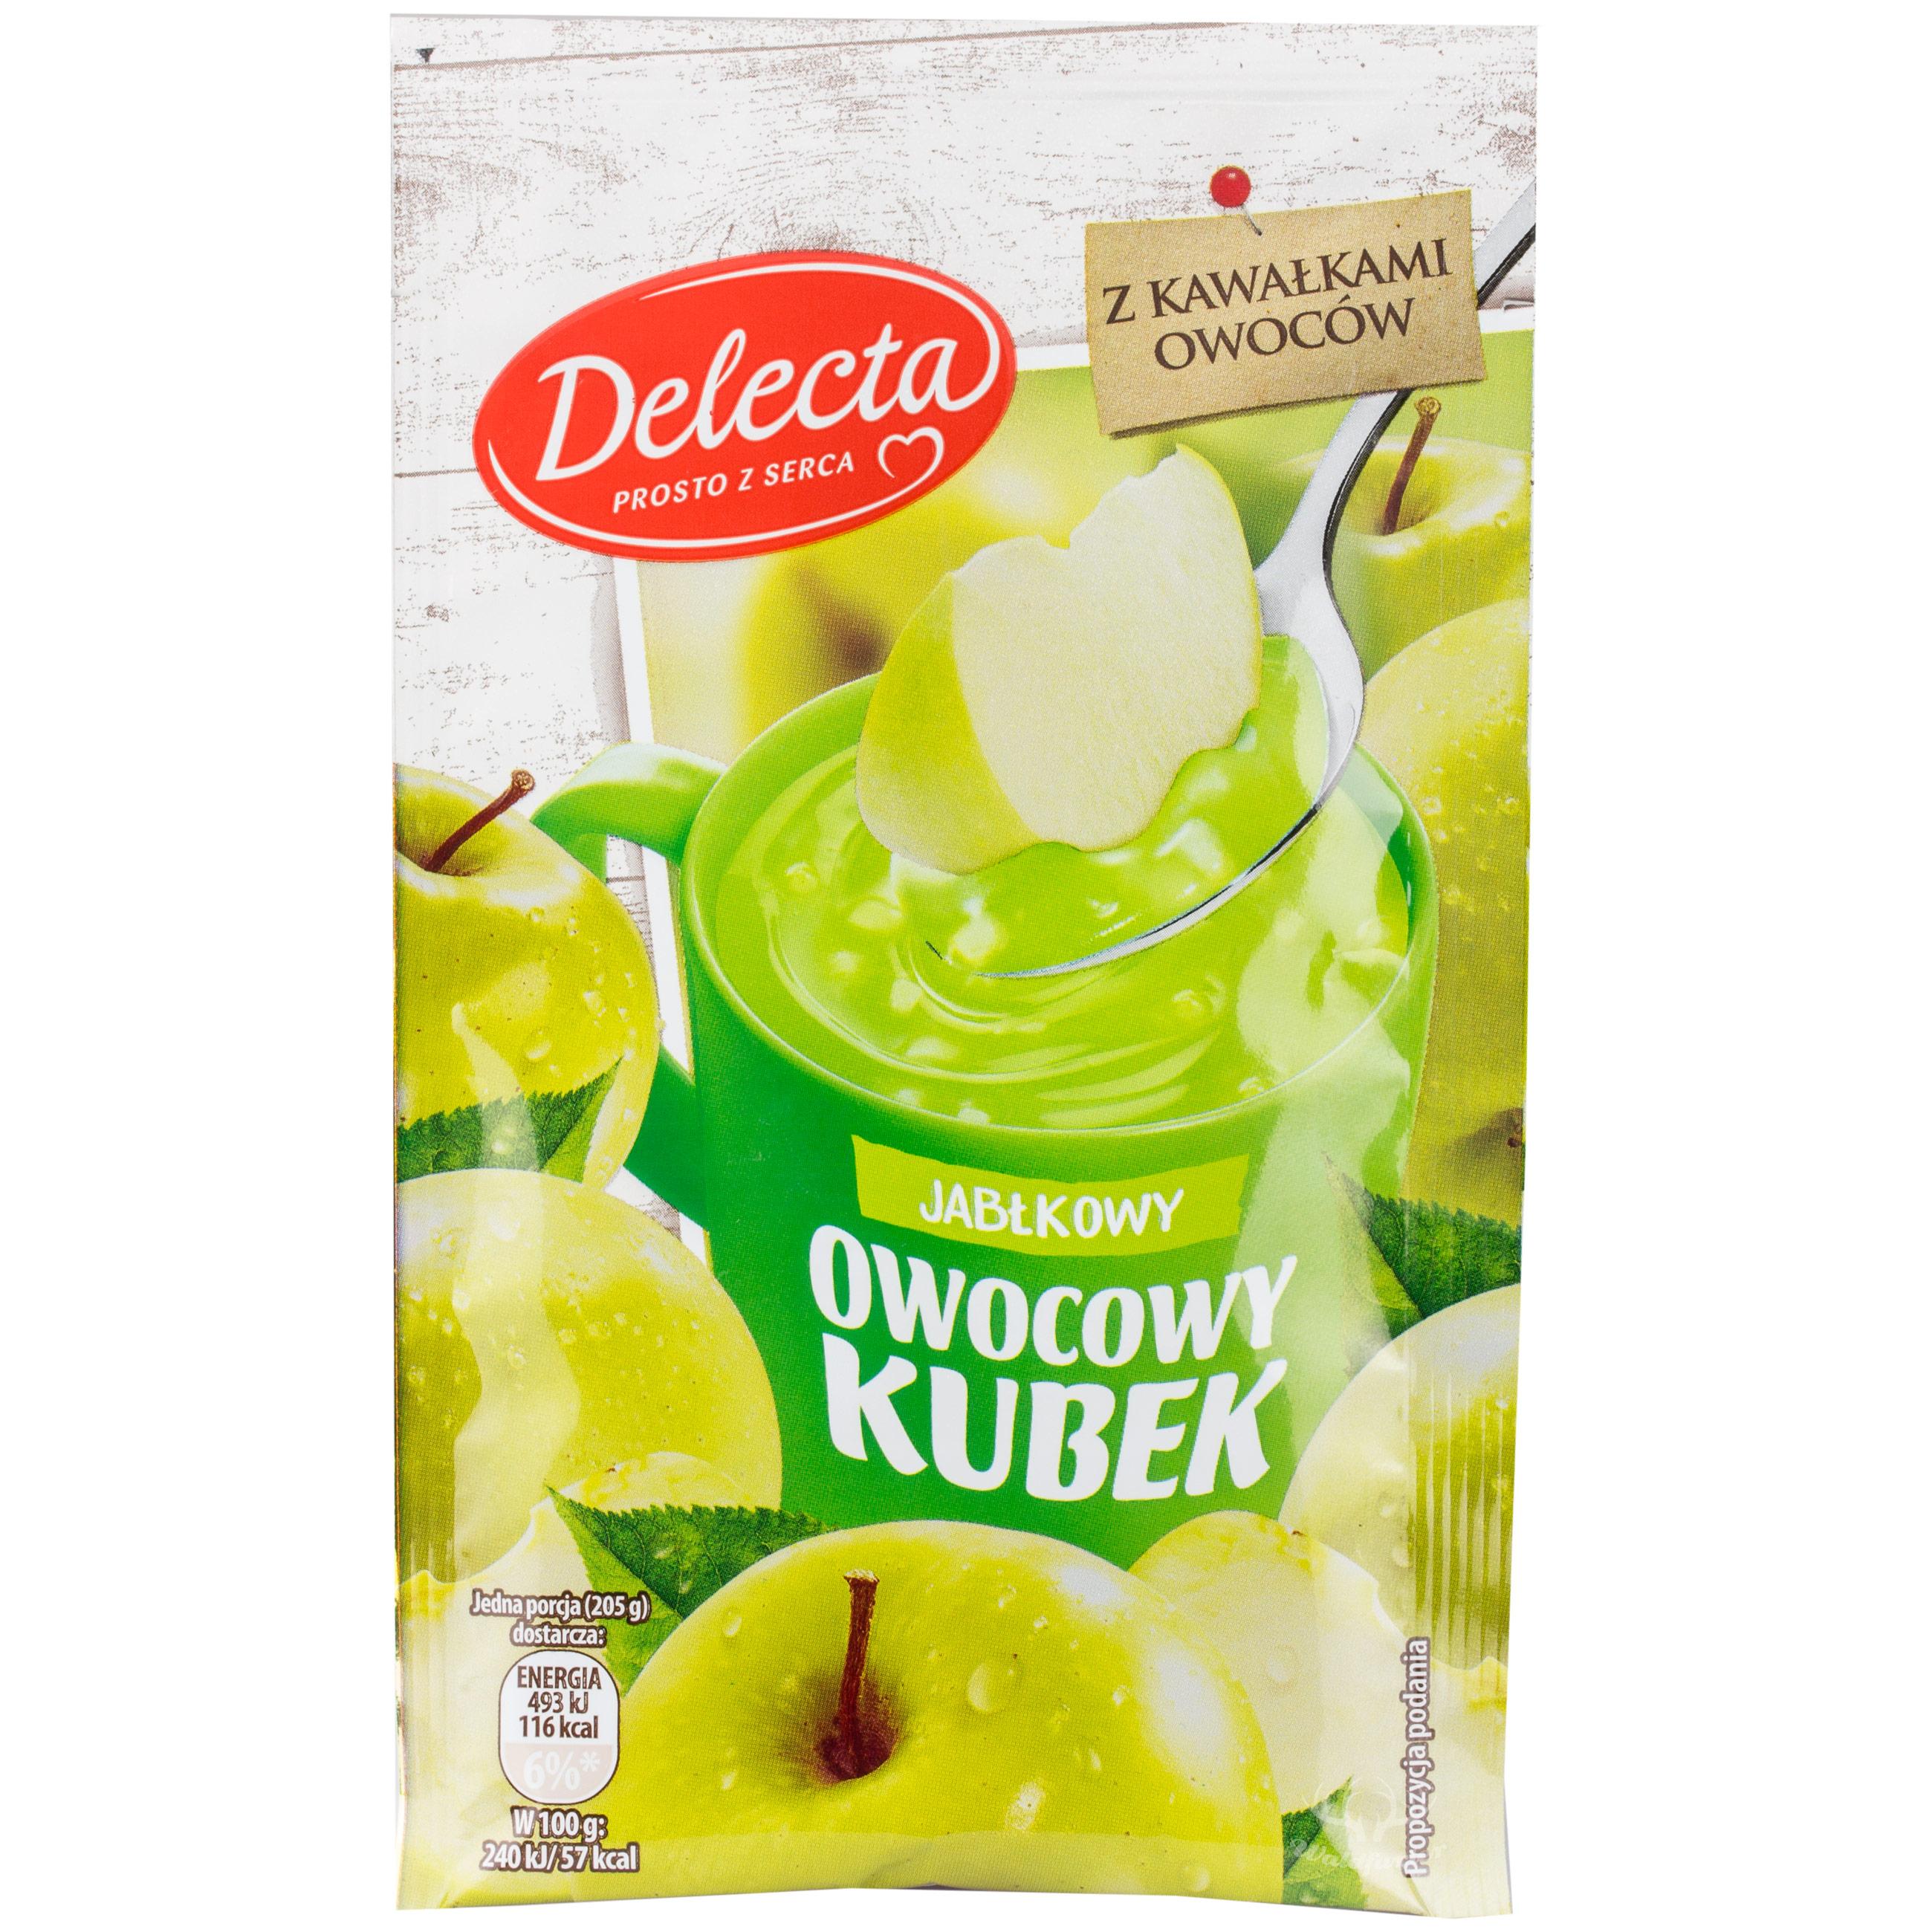 Delecta Gelee mit Apfelgeschmack 30g Obstbecher